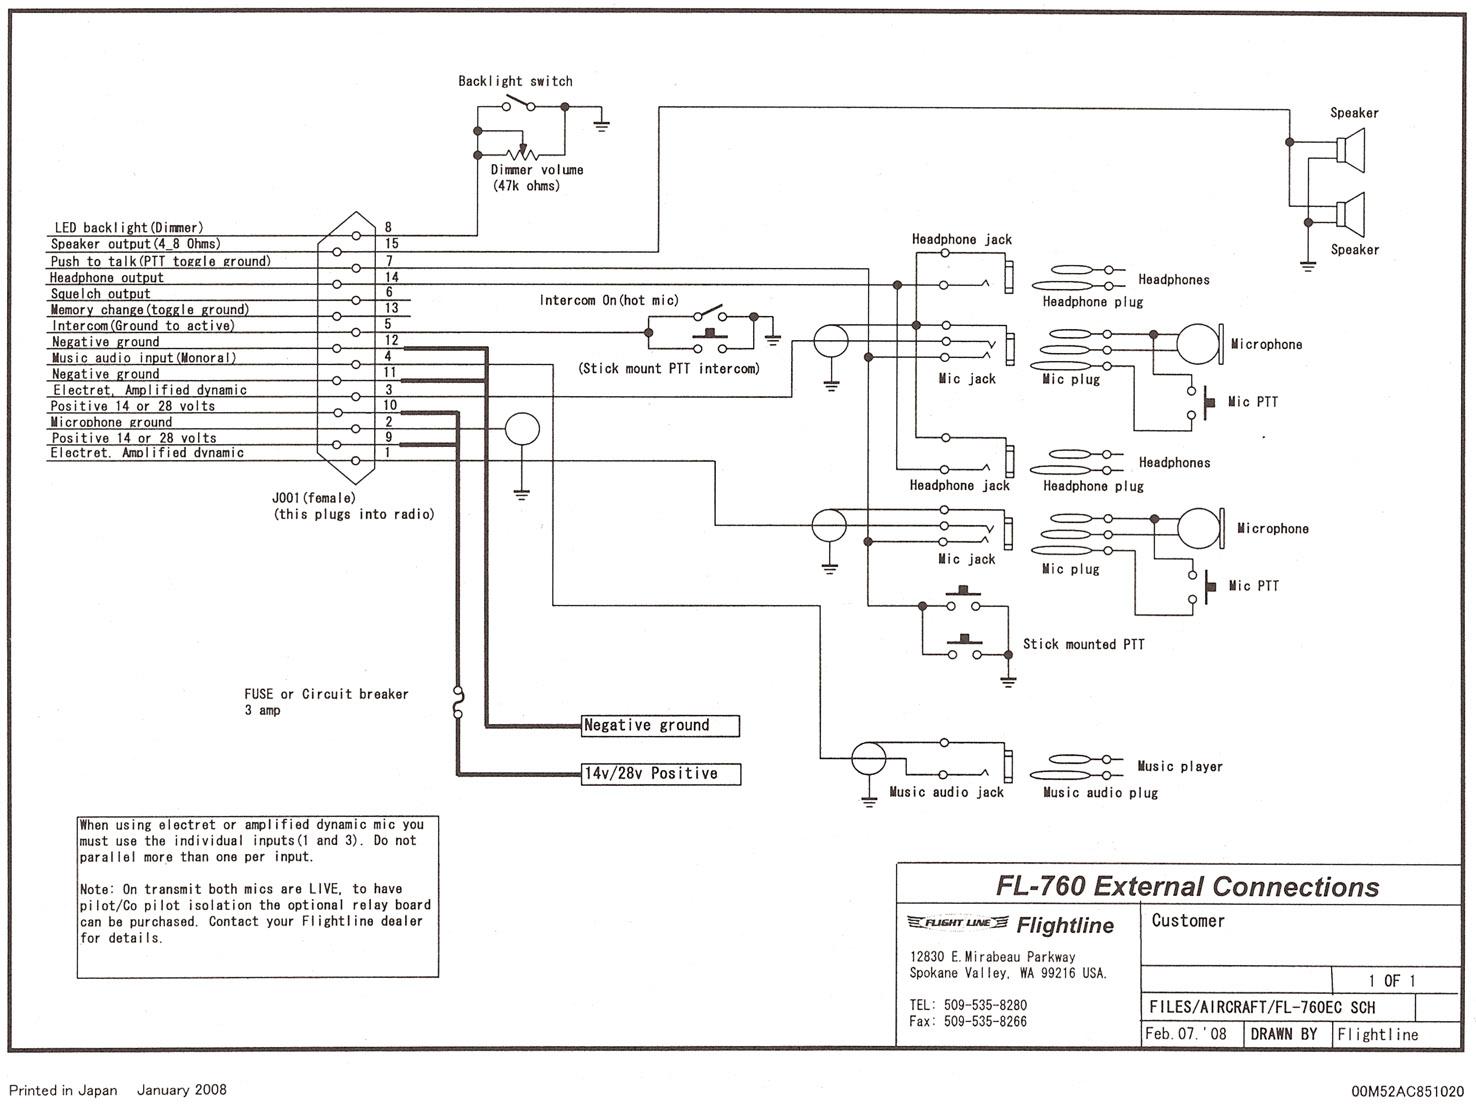 fl_760_wiring_diagram_179?resize\=665%2C499 jasco j12m20sp wiring diagram,j \u2022 indy500 co Basic Electrical Wiring Diagrams at gsmx.co